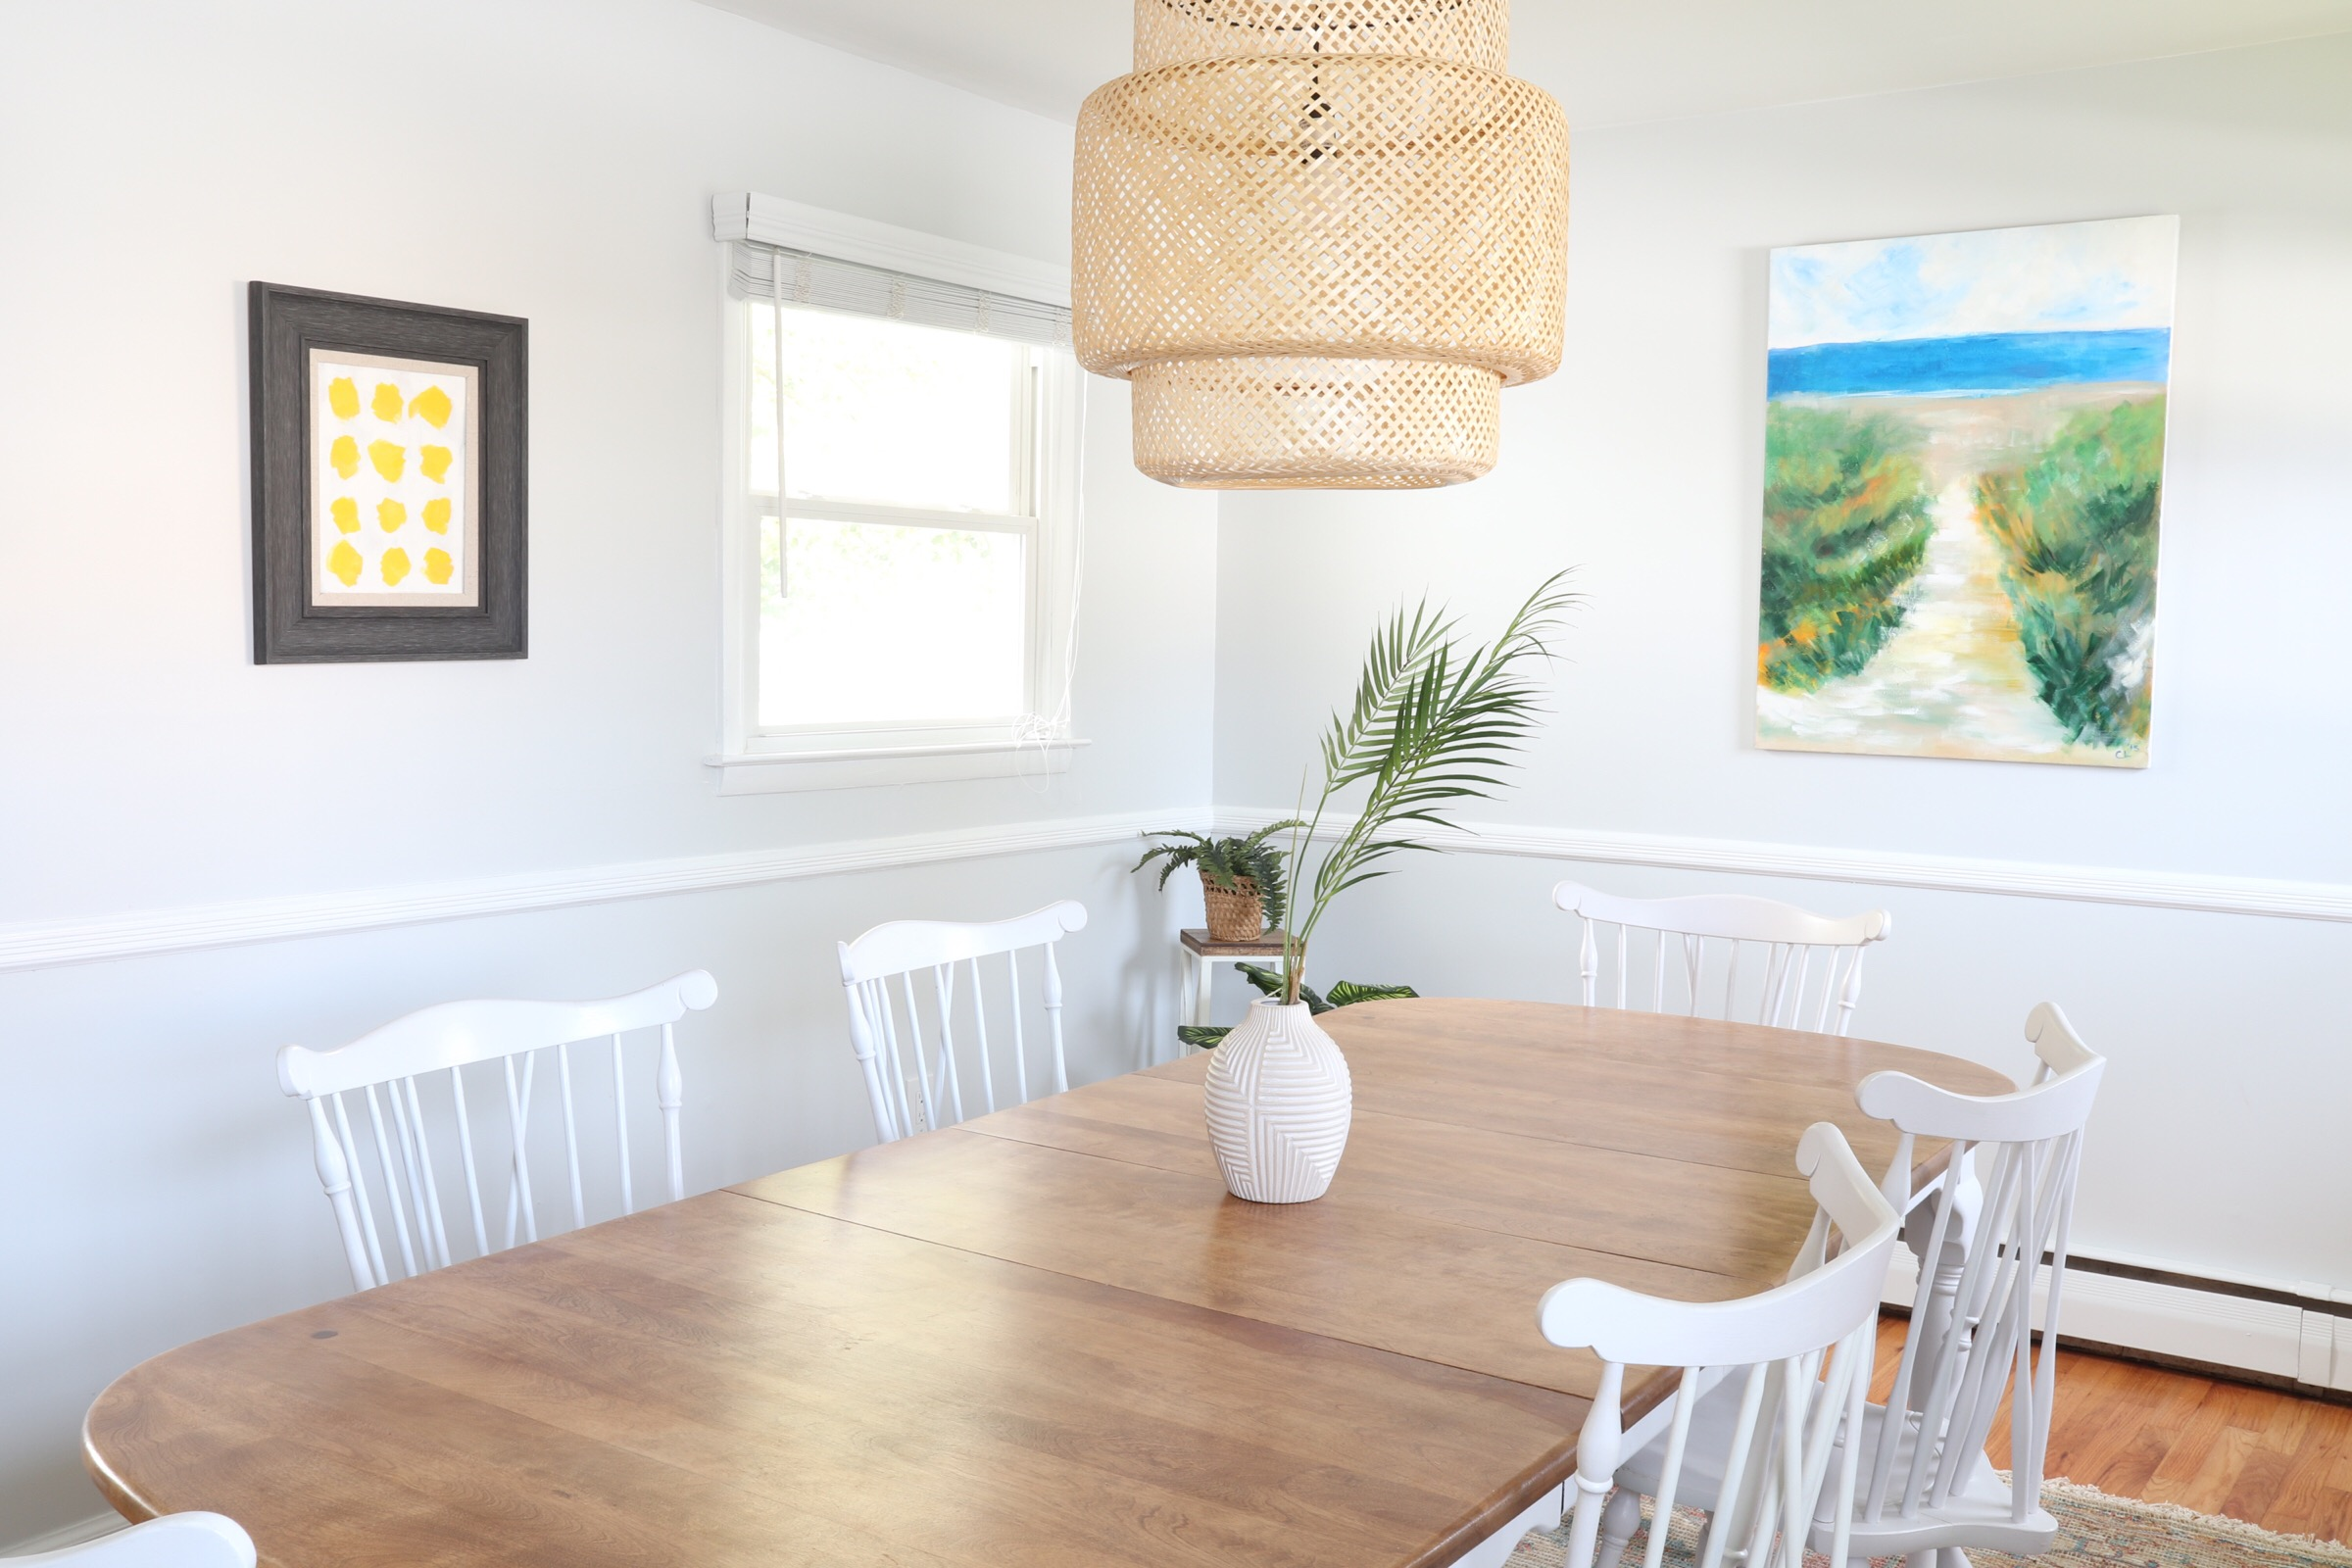 california-modern-eclectic-dining-room-02.JPG